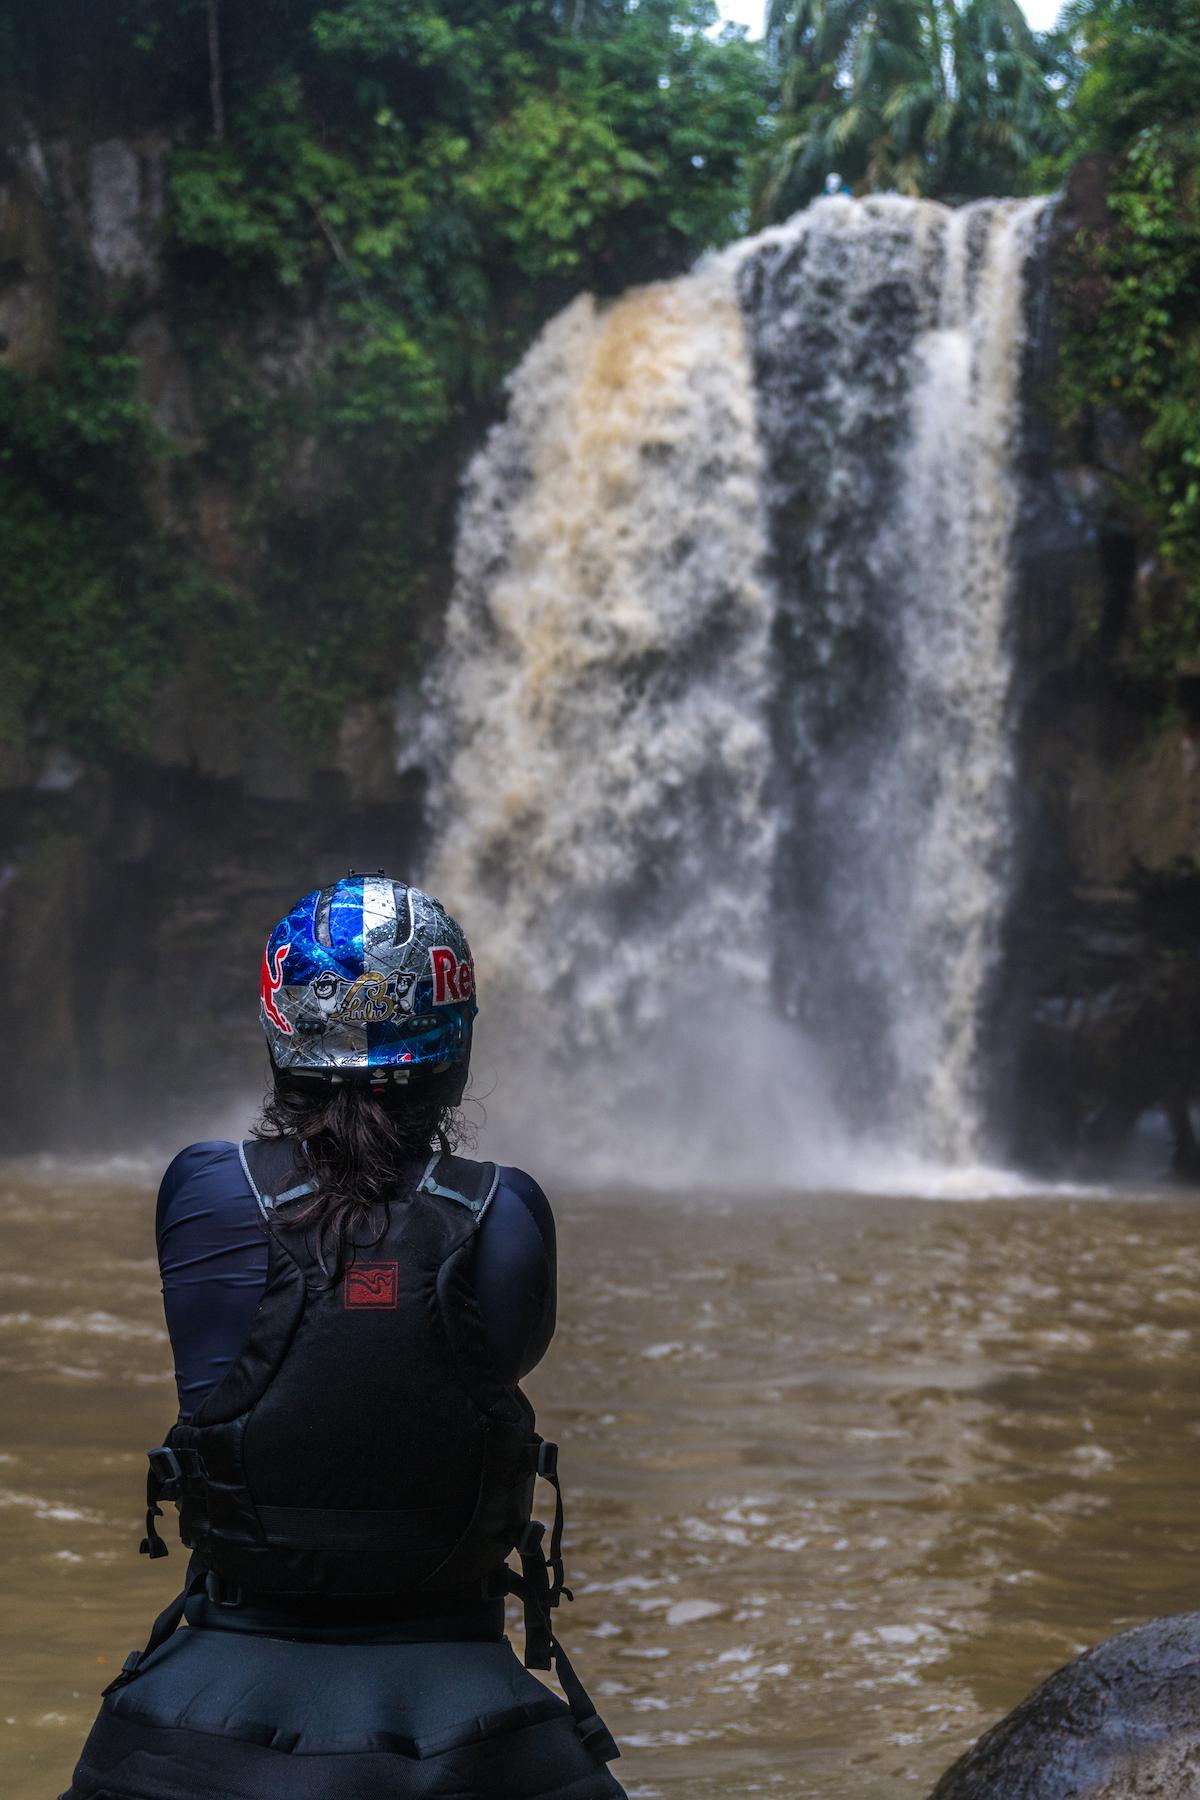 Nouria Newman Scouting A Waterfall Asahan John Haines/ Pistyll Productions